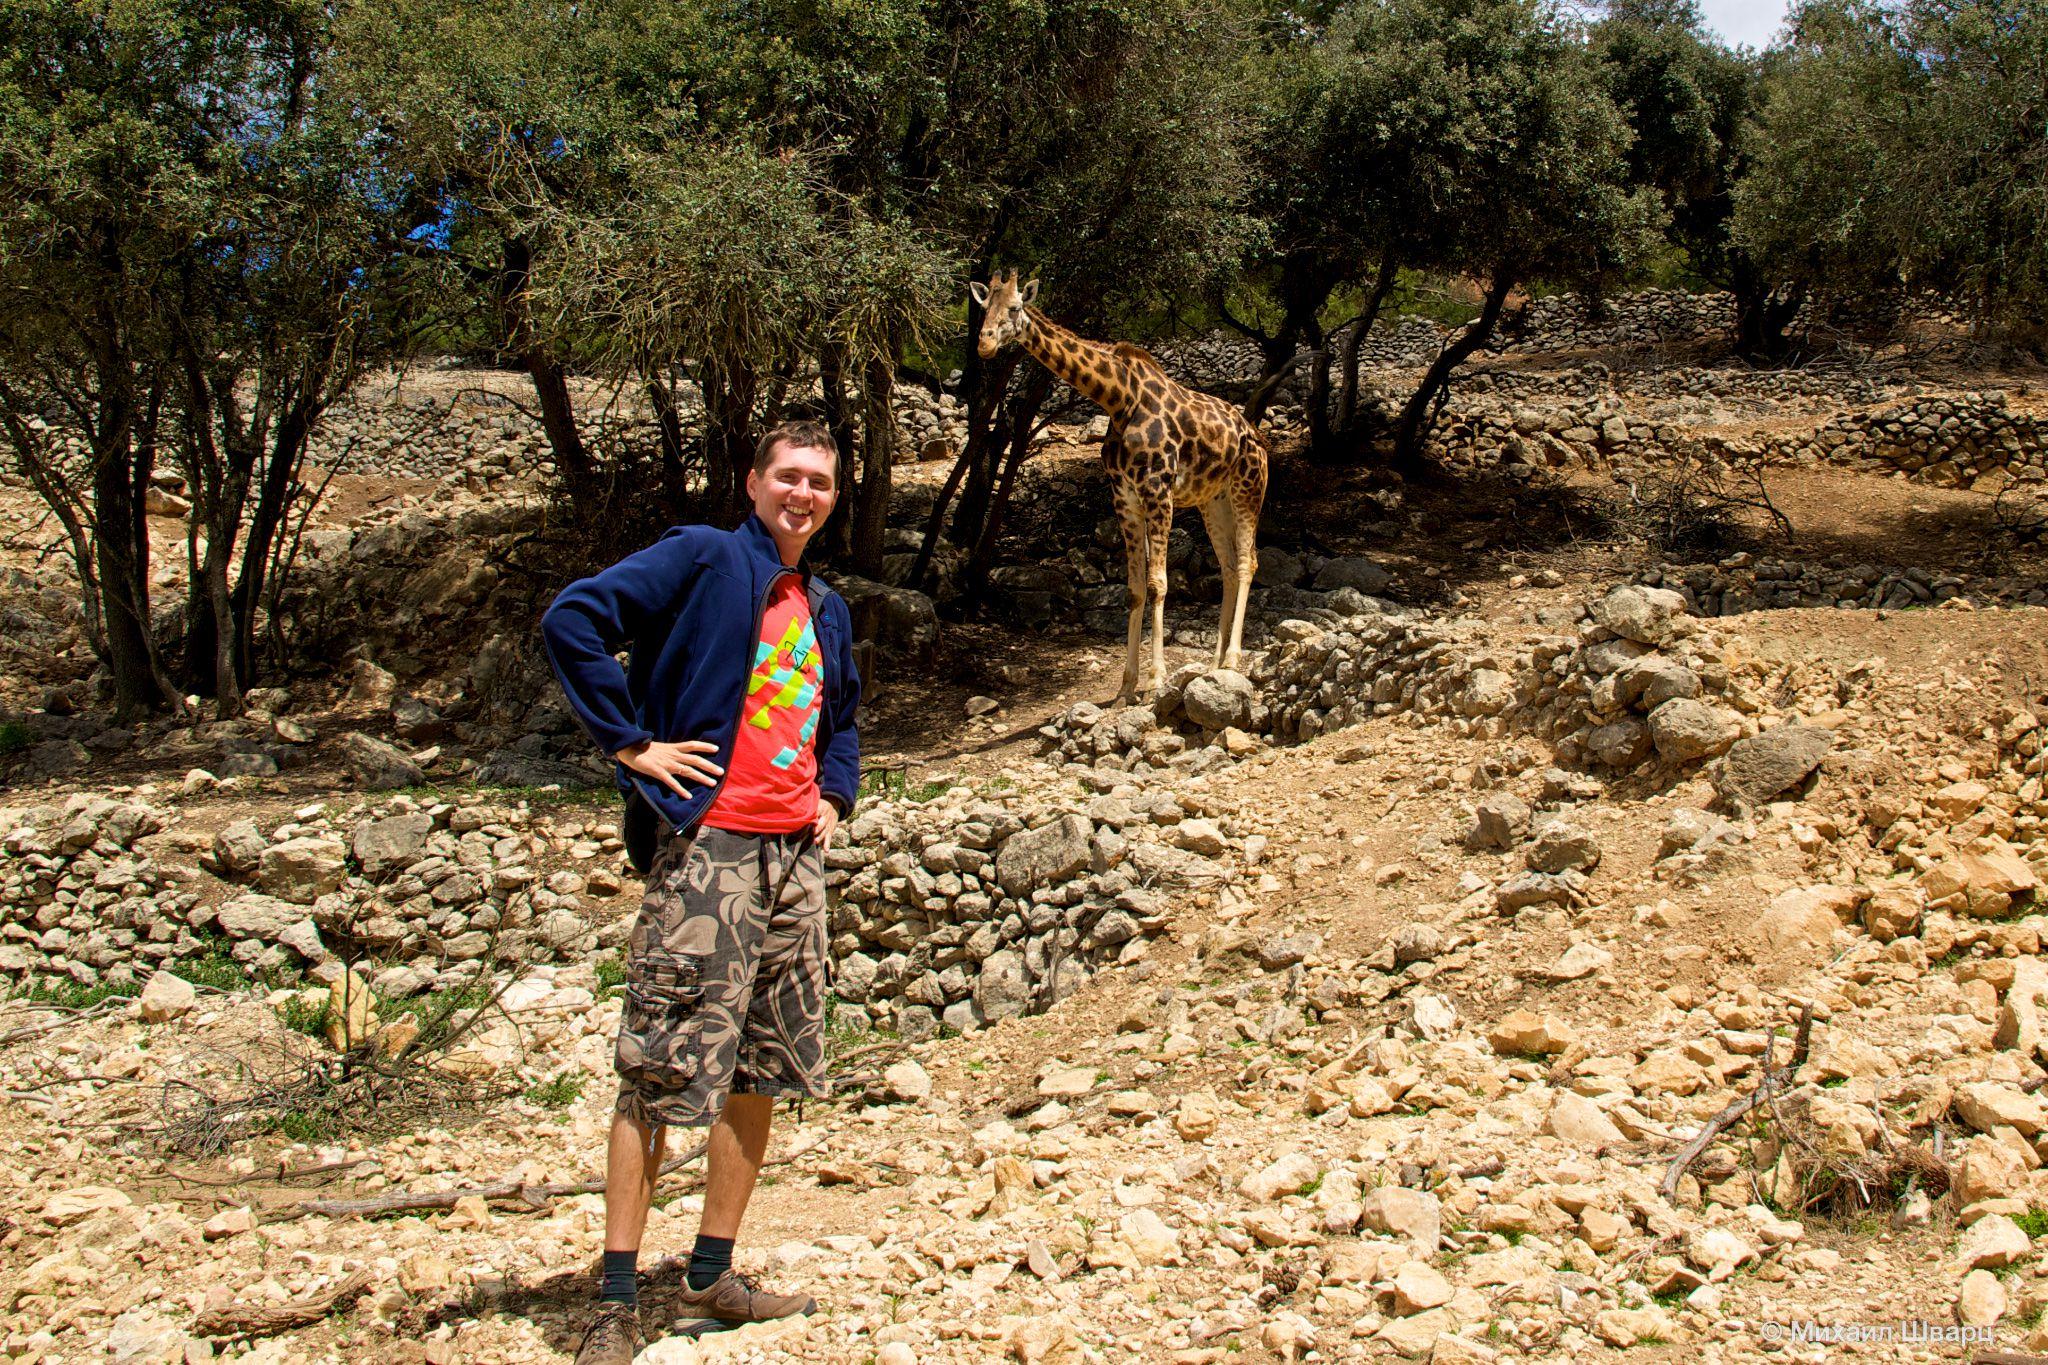 Как мы ездили на сафари со львами в Испании